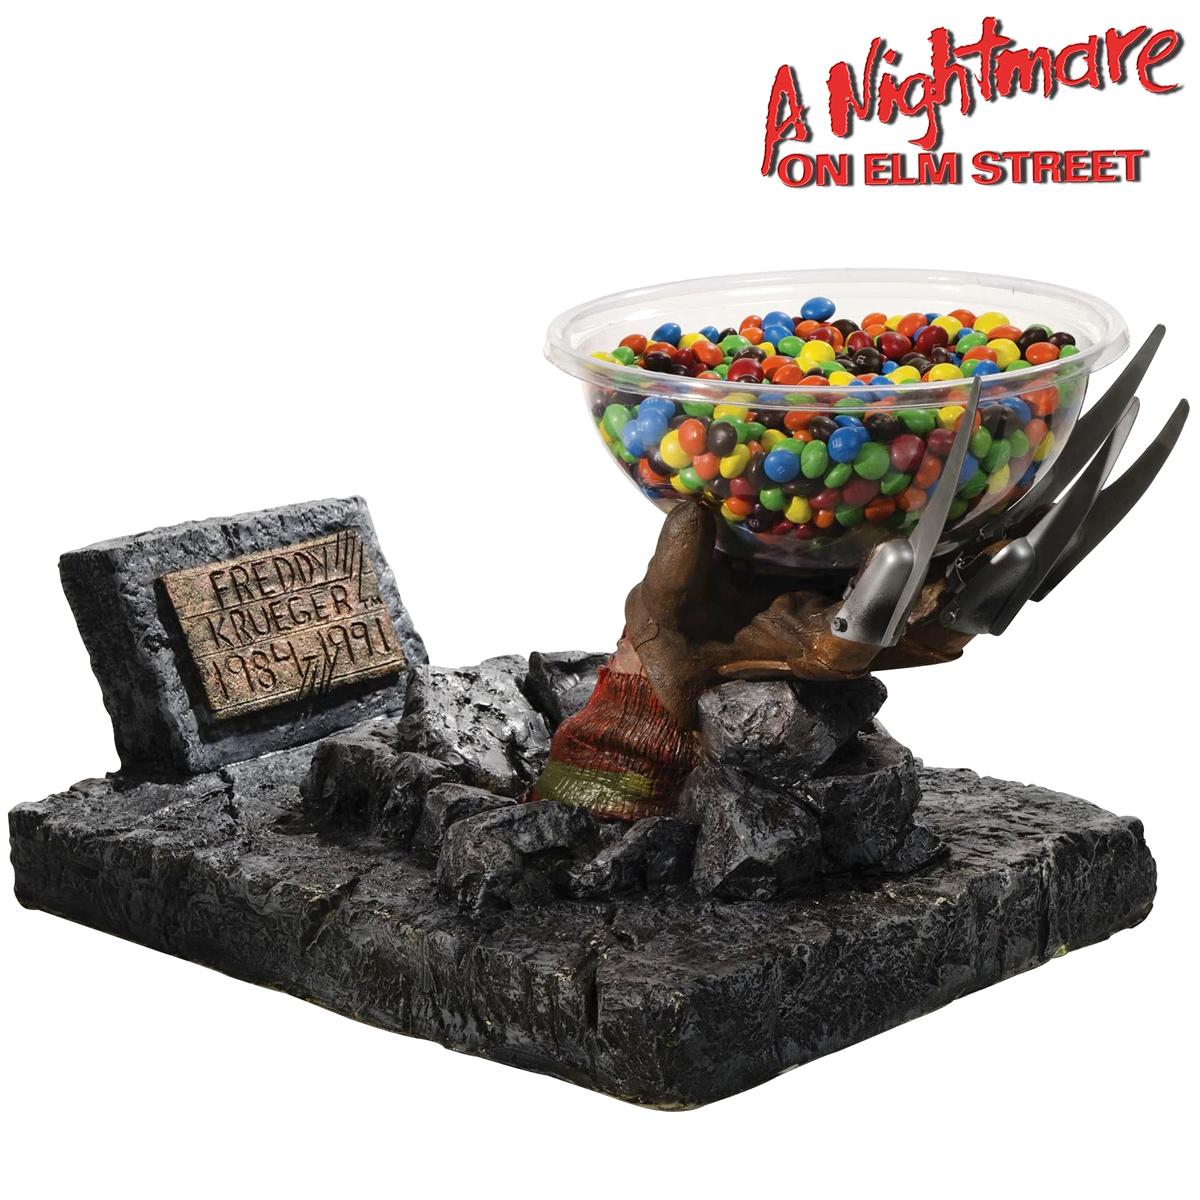 Porta-Balas Clássicos do Terror: Chucky, Pennywise, Jigsaw Billy e Freddy Krueger